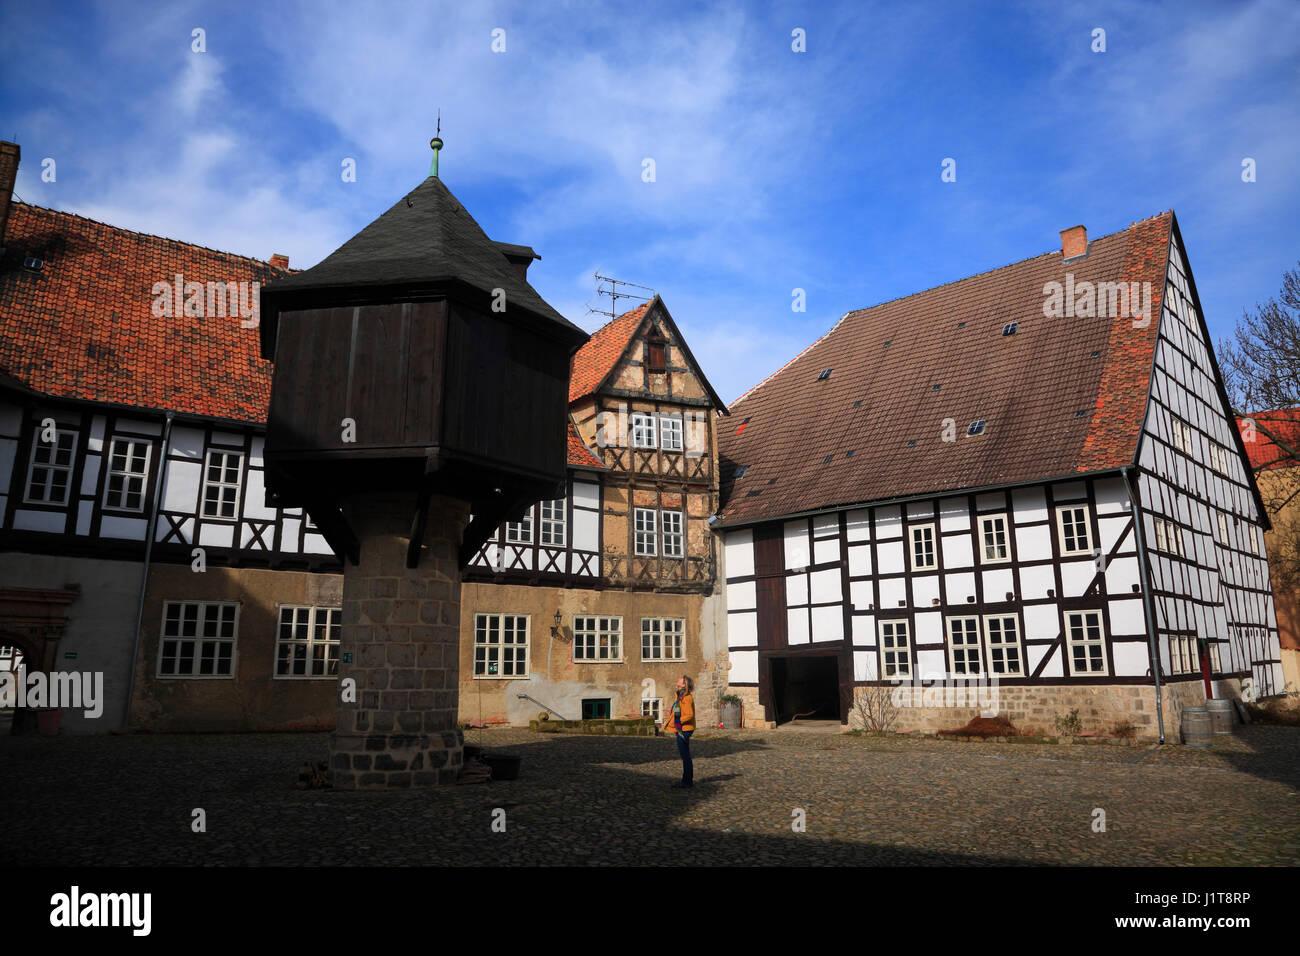 Adelshof, Quedlinburg, Saxony-Anhalt, Germany, Europe - Stock Image